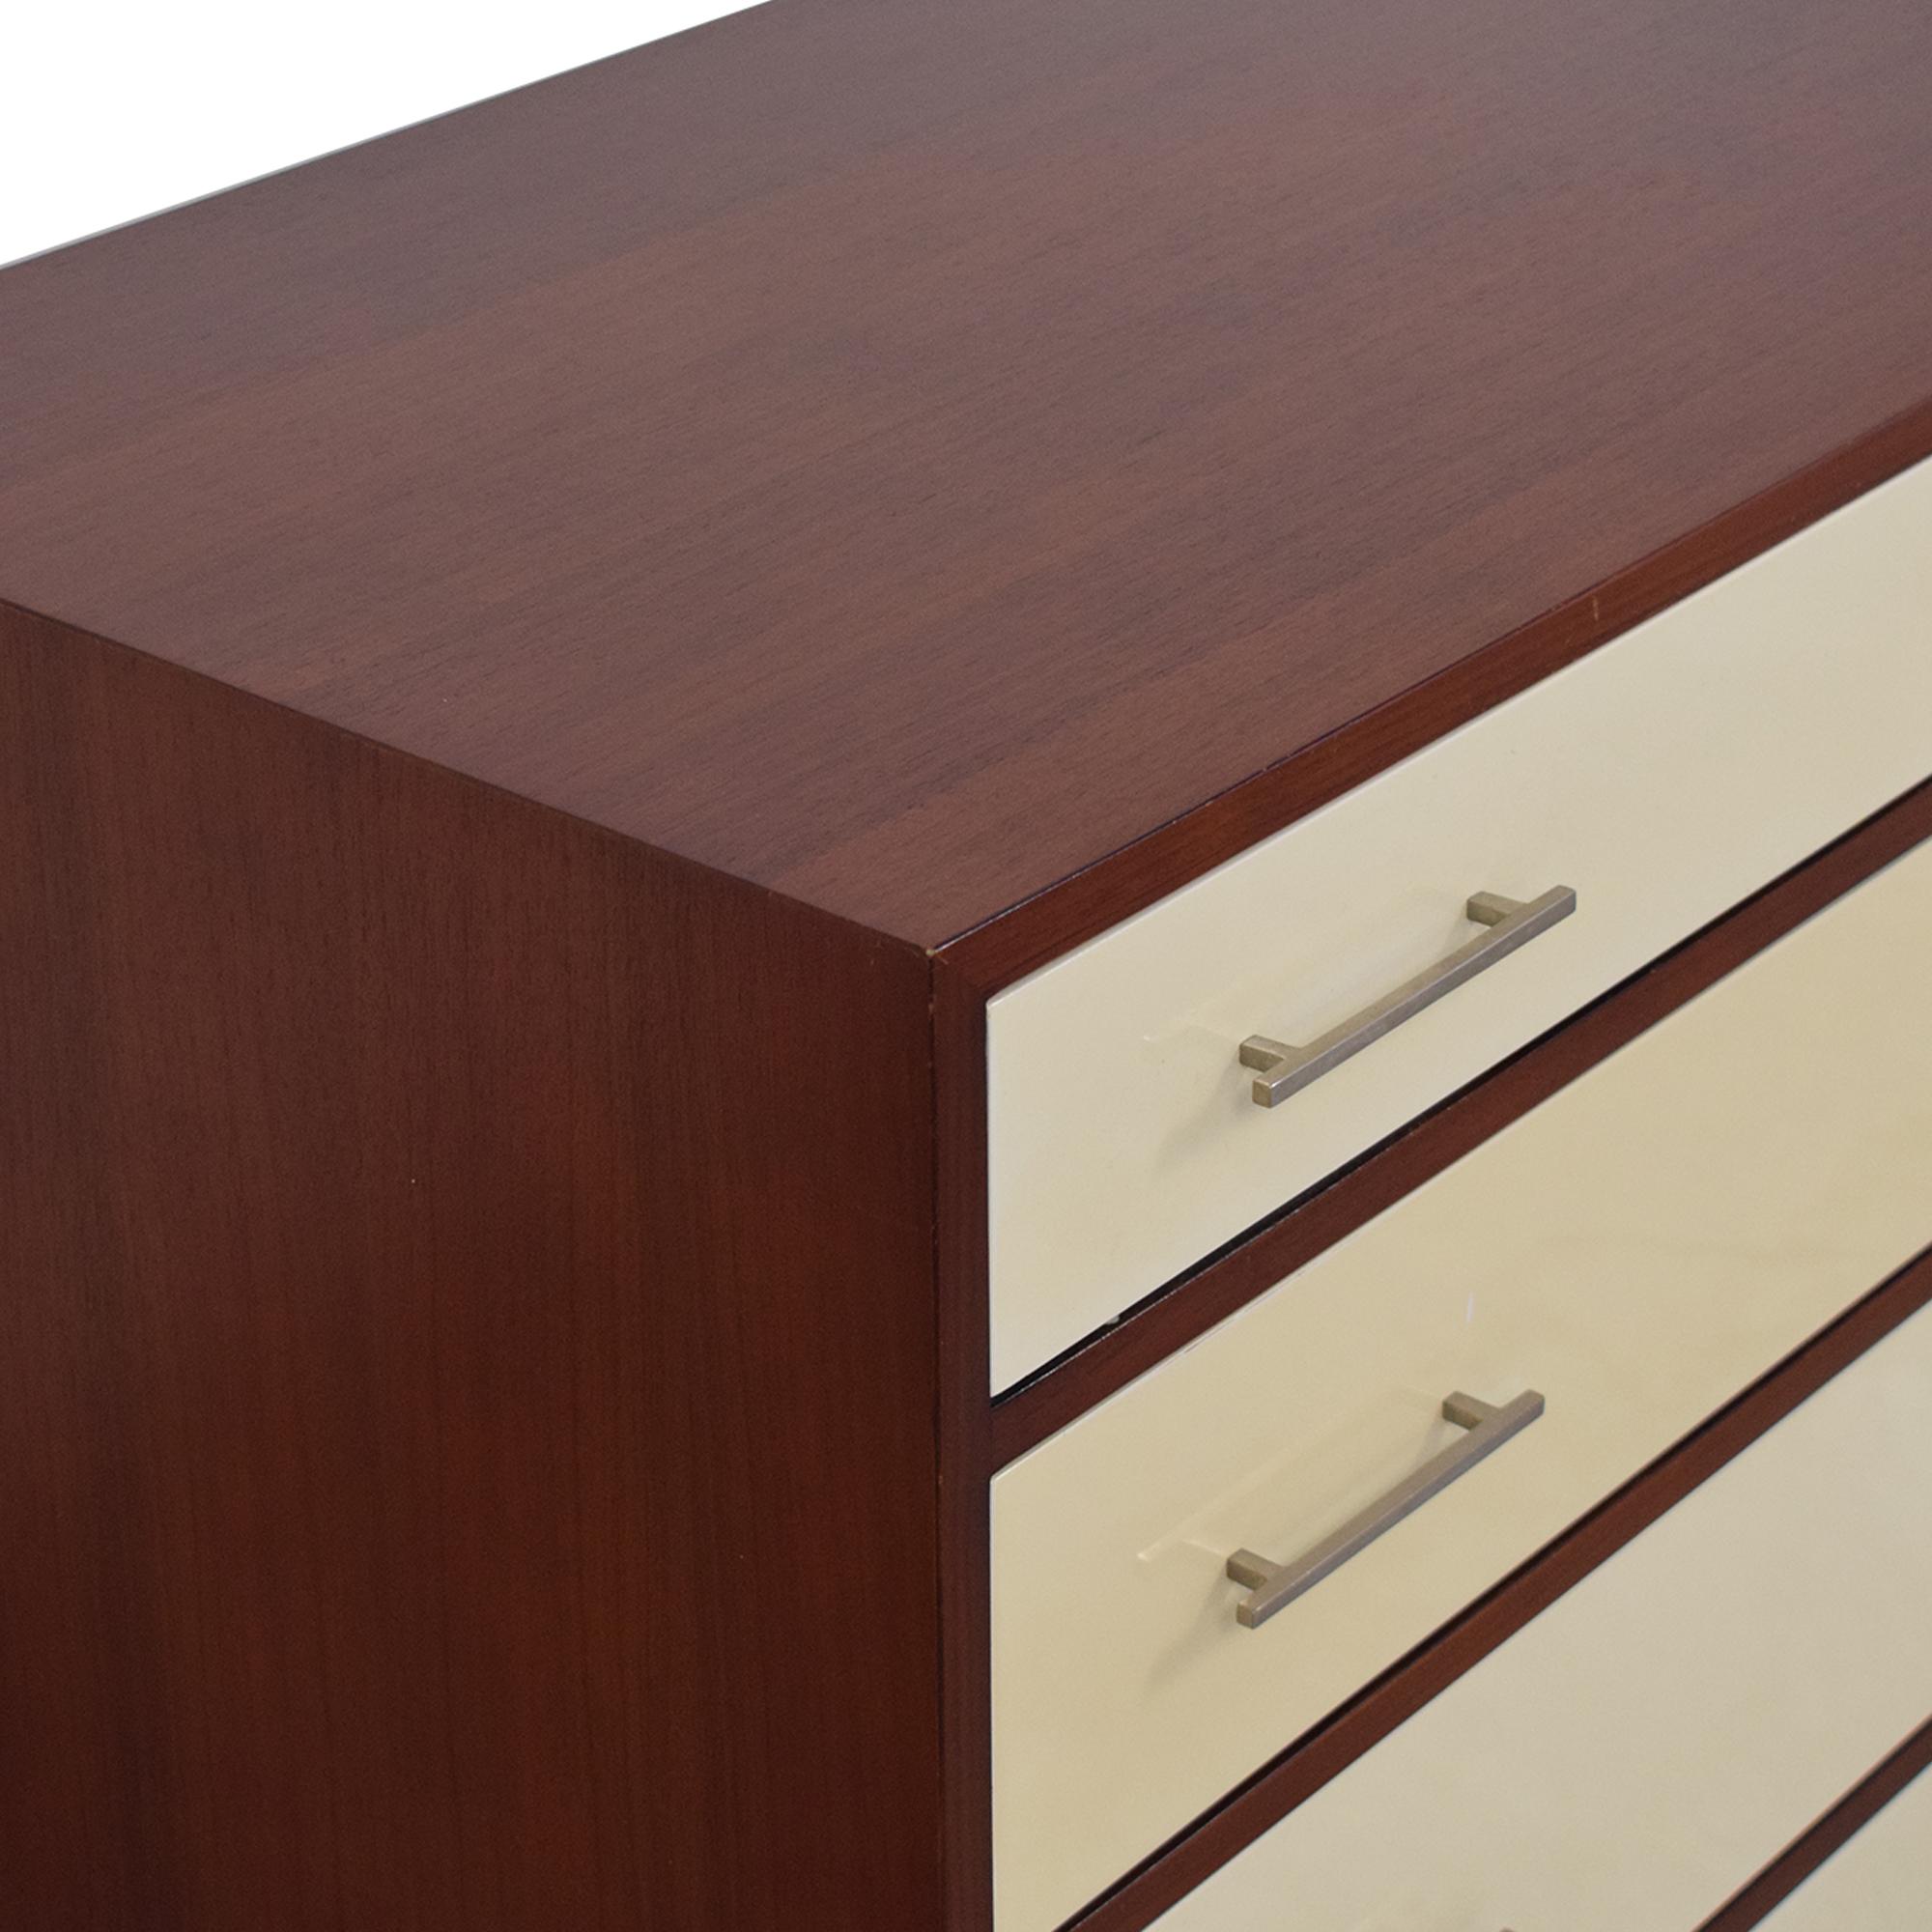 Mitchell Gold + Bob Williams Mitchell Gold + Bob Williams Hughes Eight Drawer Dresser Dressers